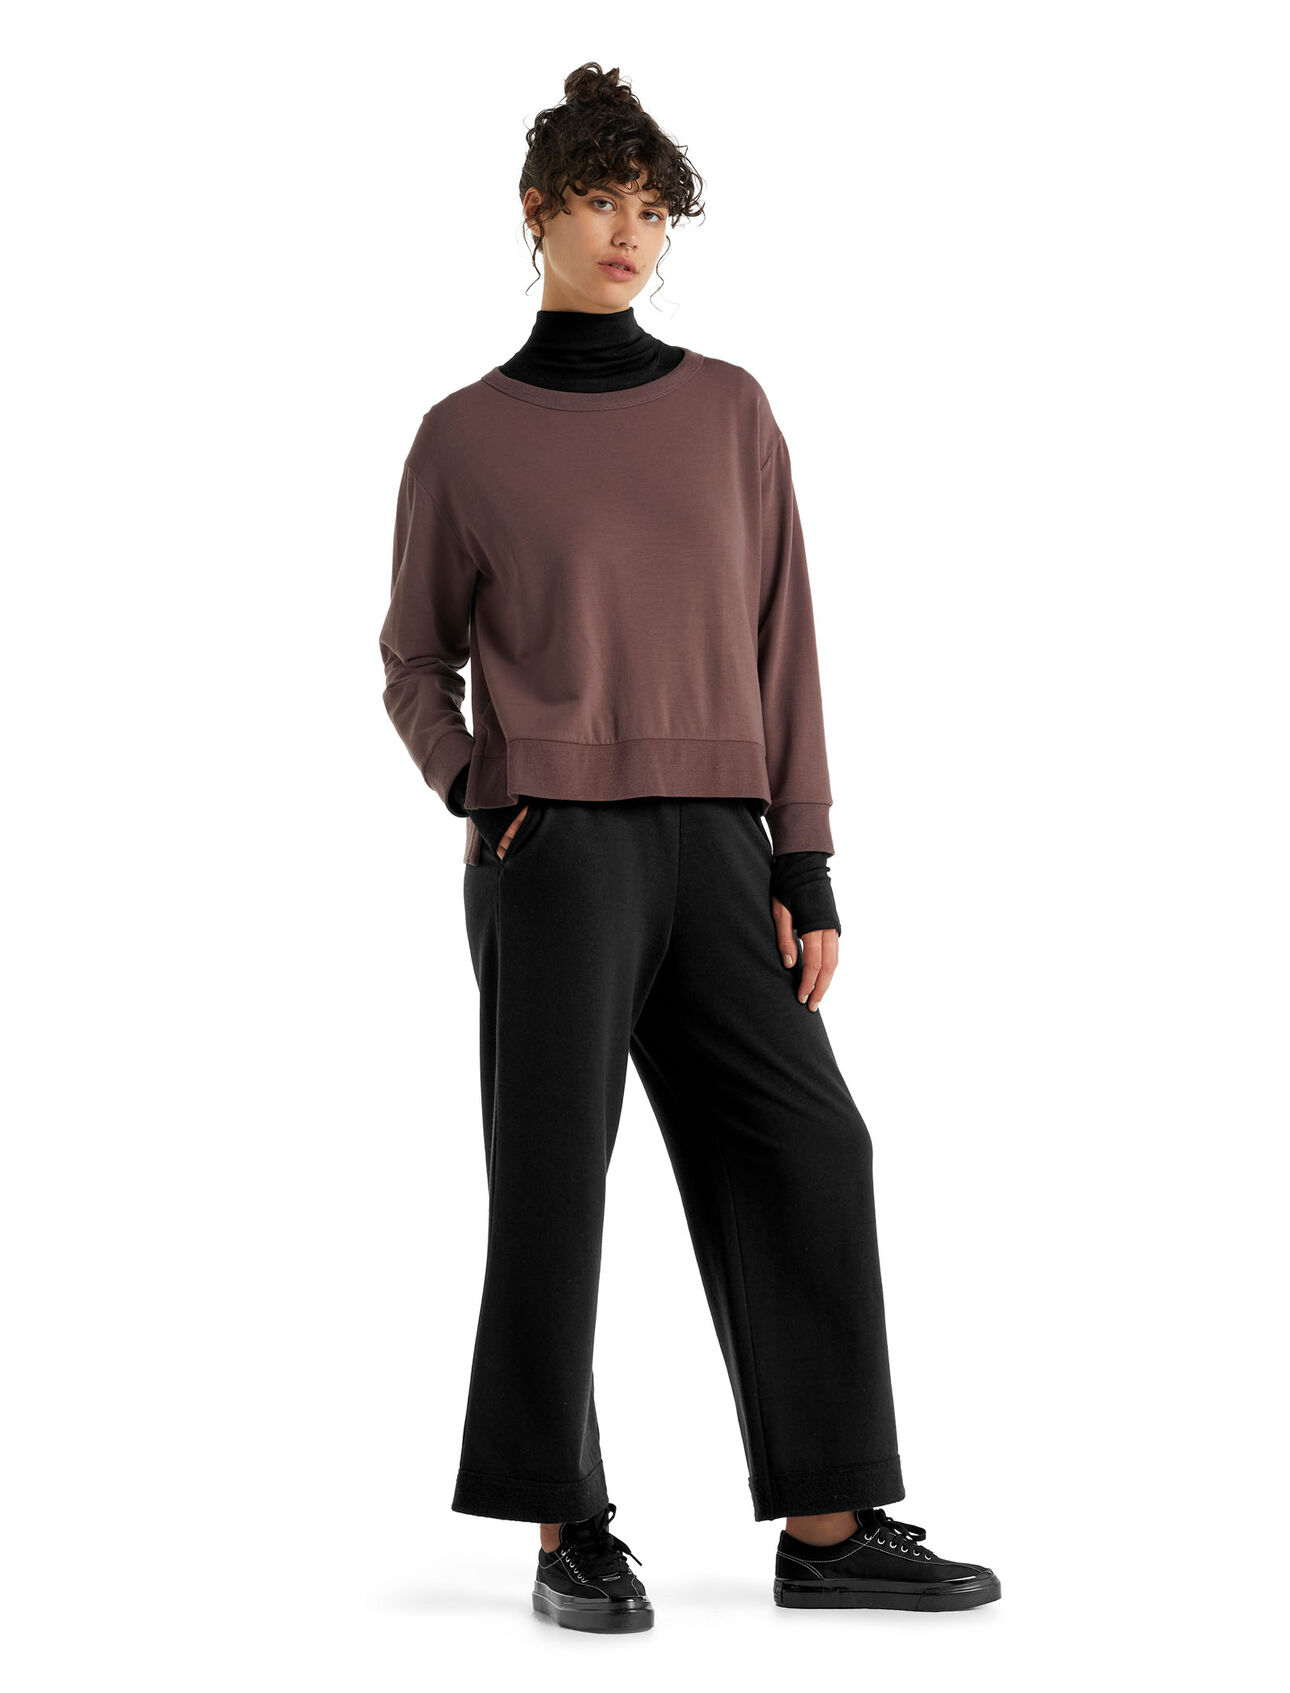 Women's Dalston Sweatshirt & Pants